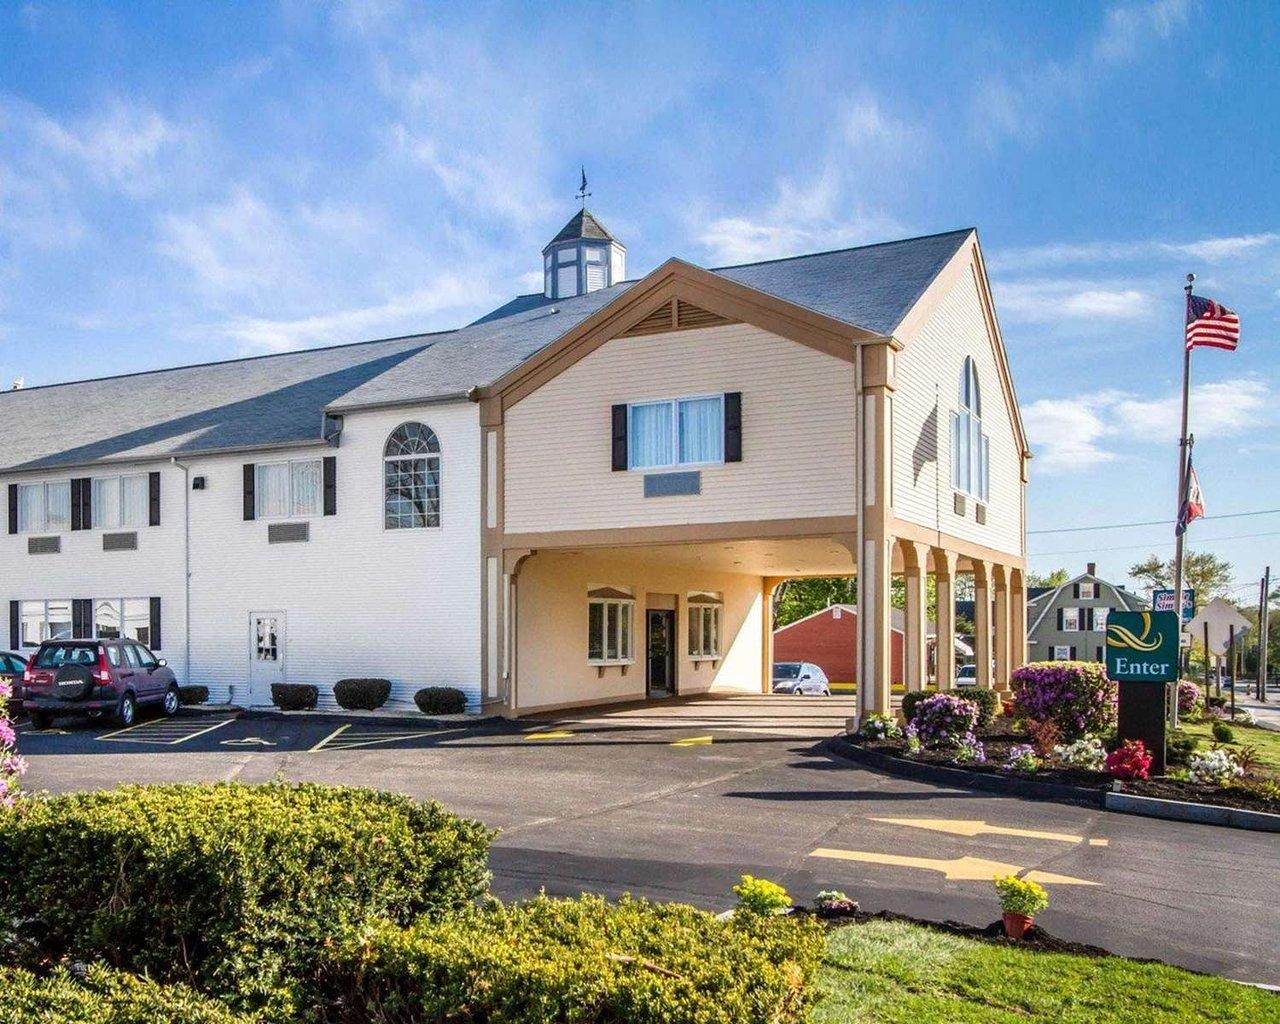 the 10 best hotels in scarborough me for 2019 from 38 tripadvisor rh tripadvisor com